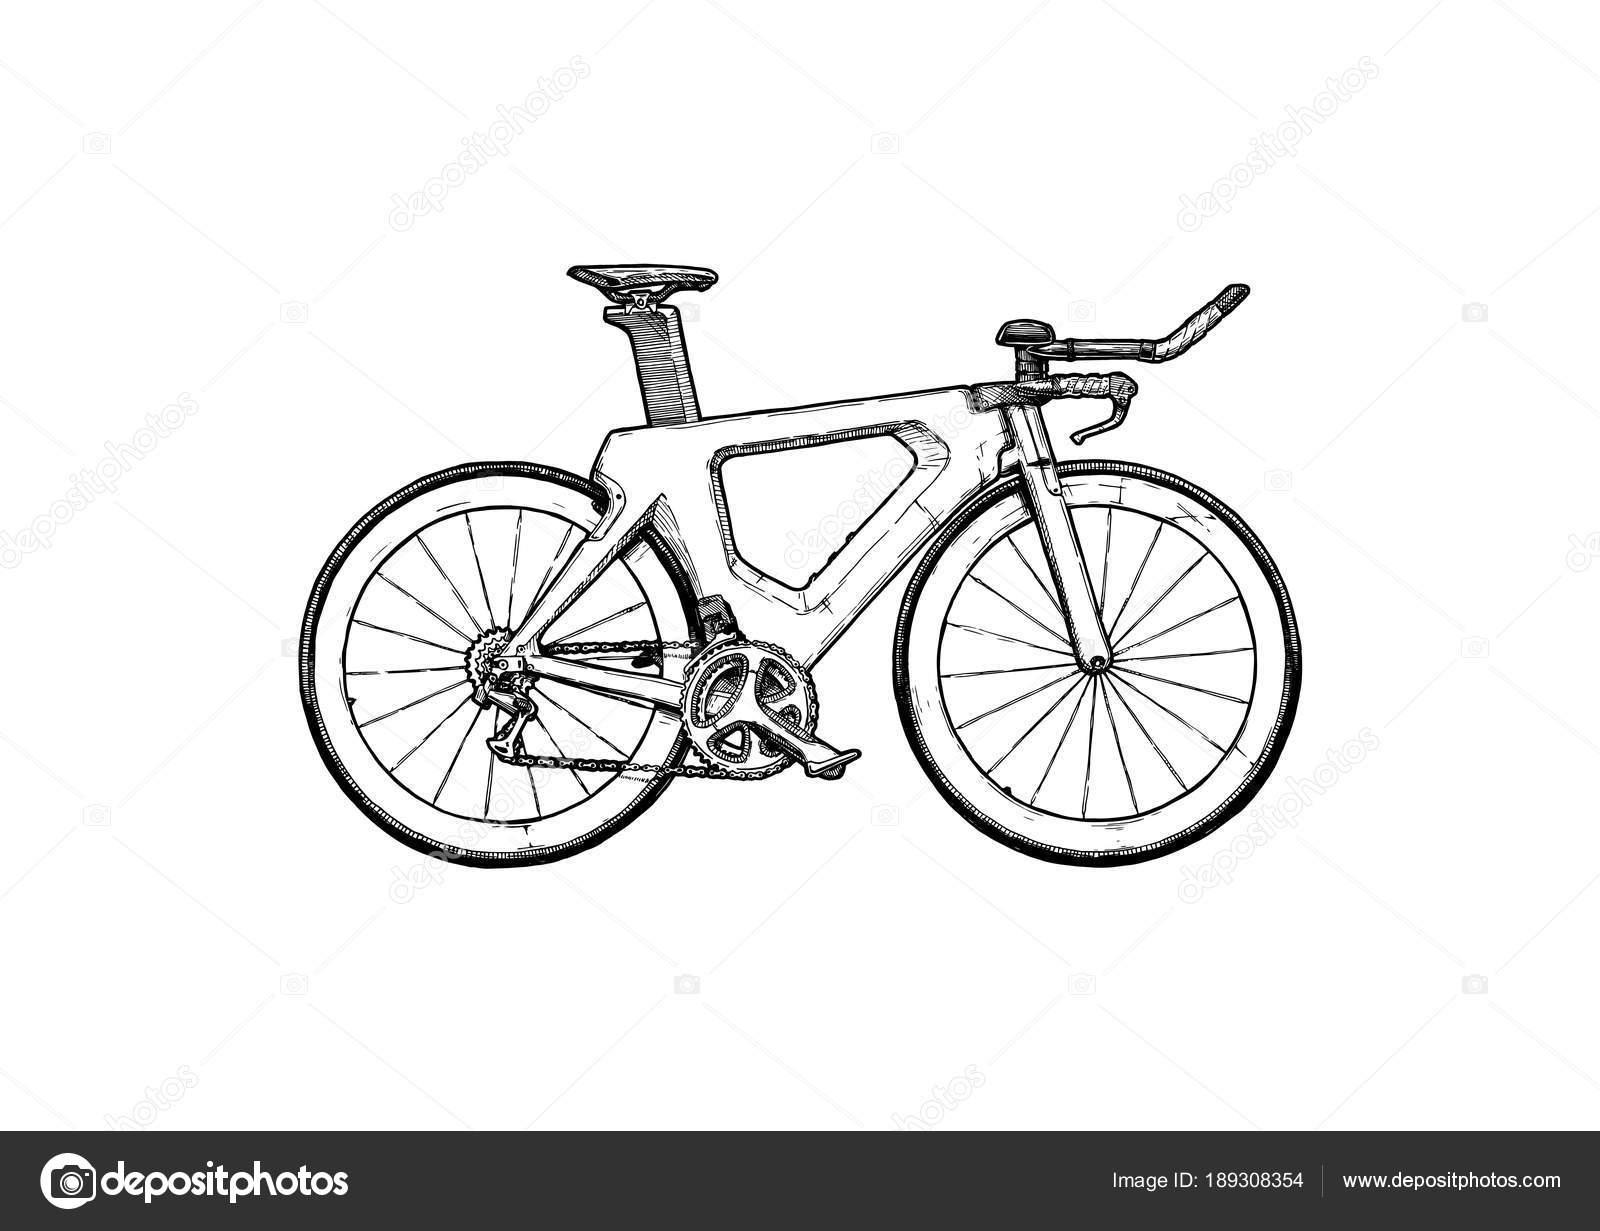 BICYCLE I CZAS PDF DOWNLOAD